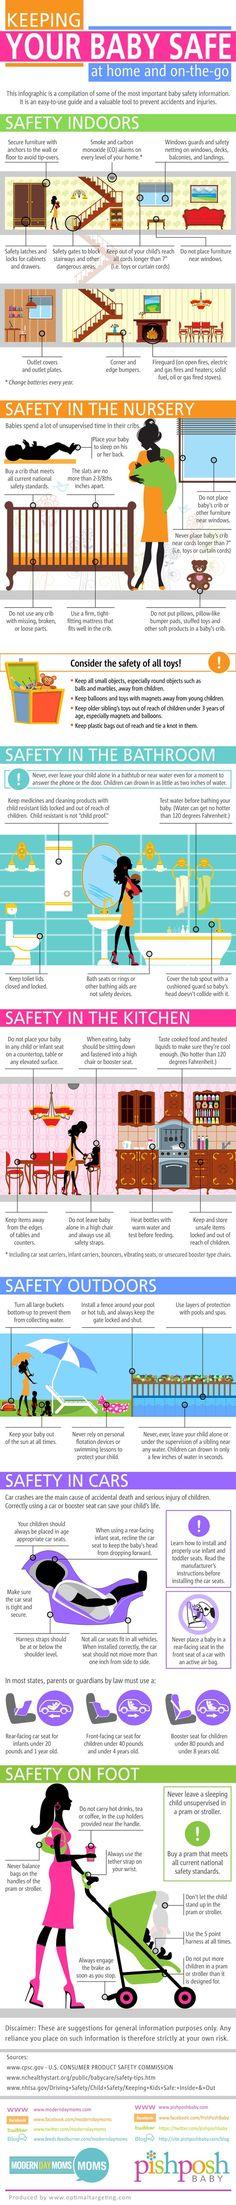 .Safety & Supervision - Work